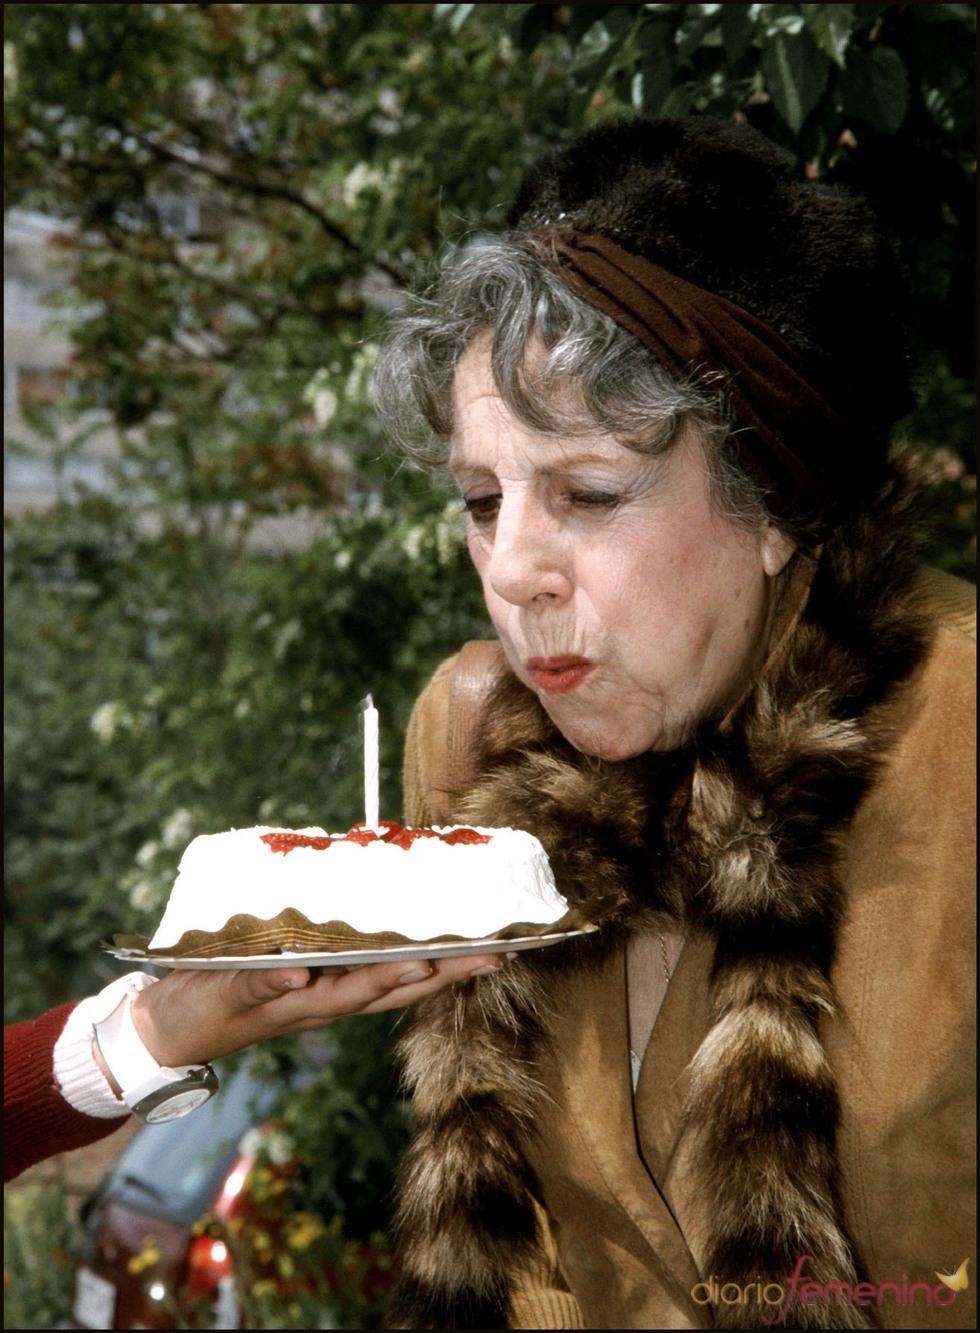 María Isbert sopla una tarta de cumpleaños